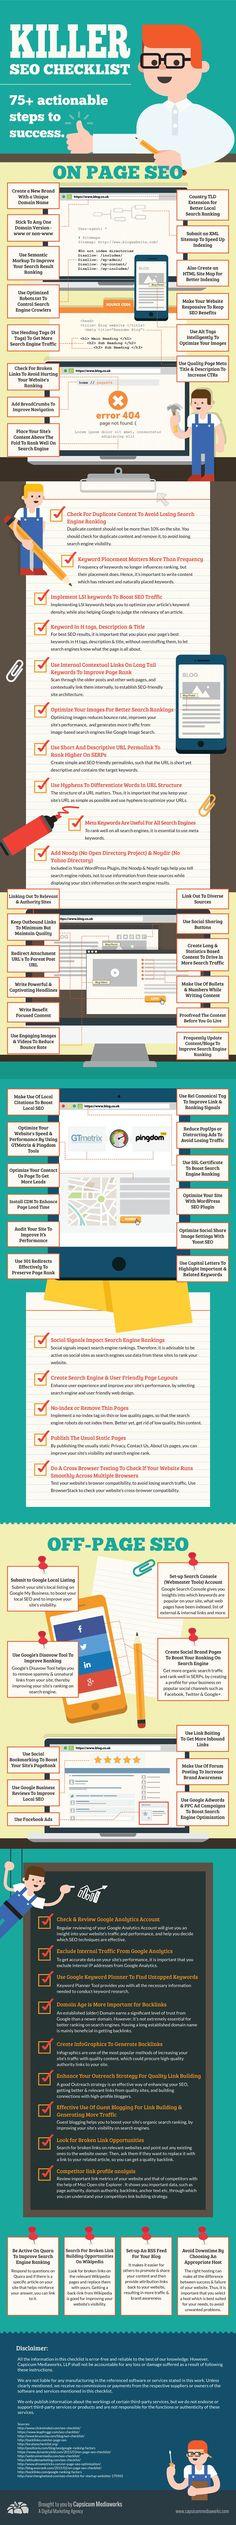 Killer SEO Checklist - #OnPage #SEO #OffPage #Suchmaschinenoptimierung